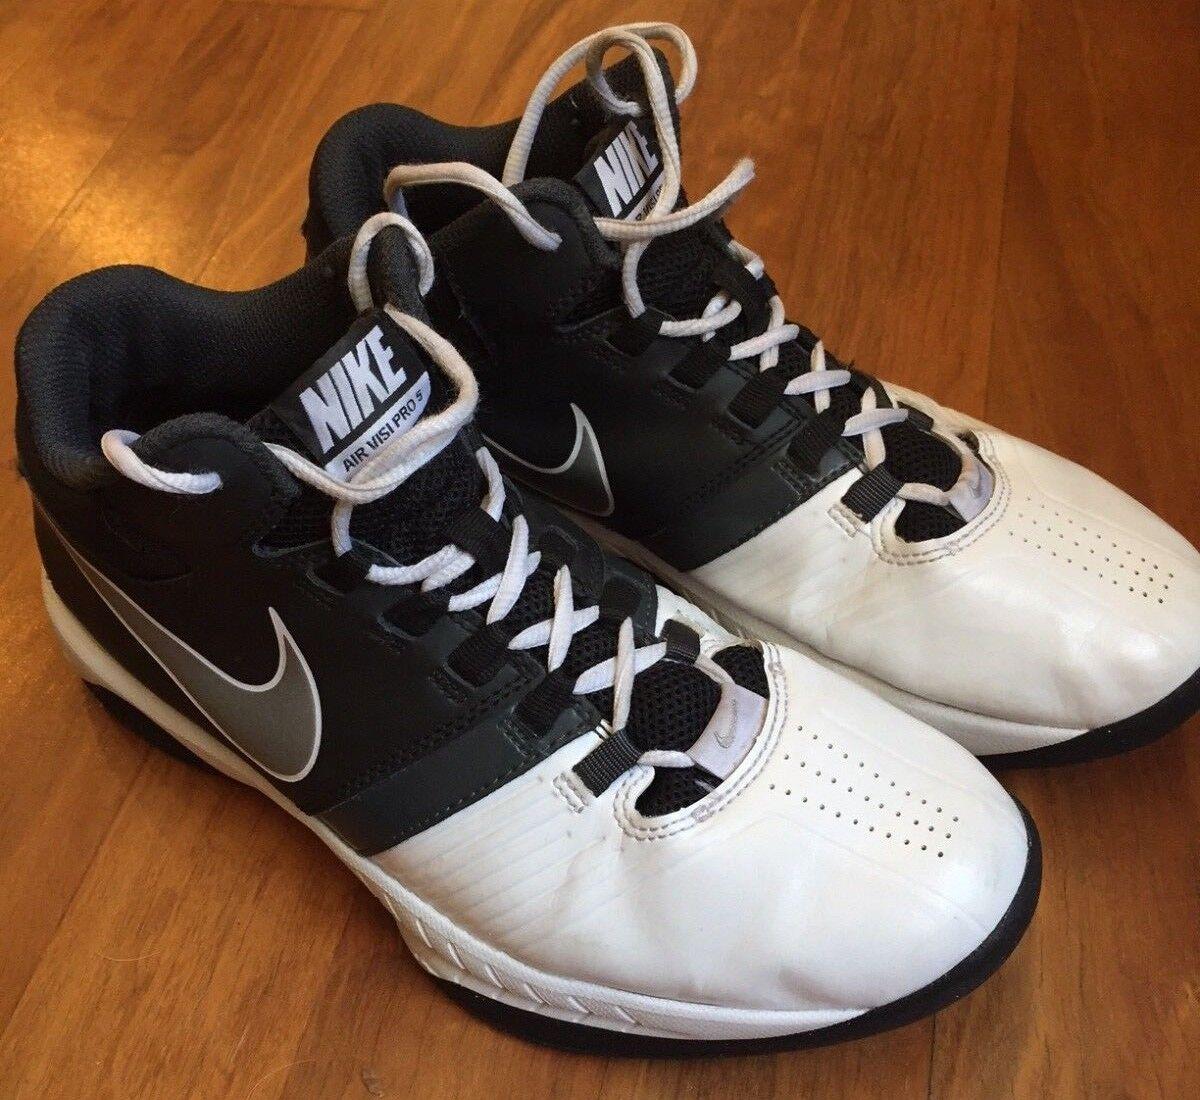 Nike Nike Nike Air visi Pro 5 Mujer mid de top Zapatos comodos estacional de c9526d